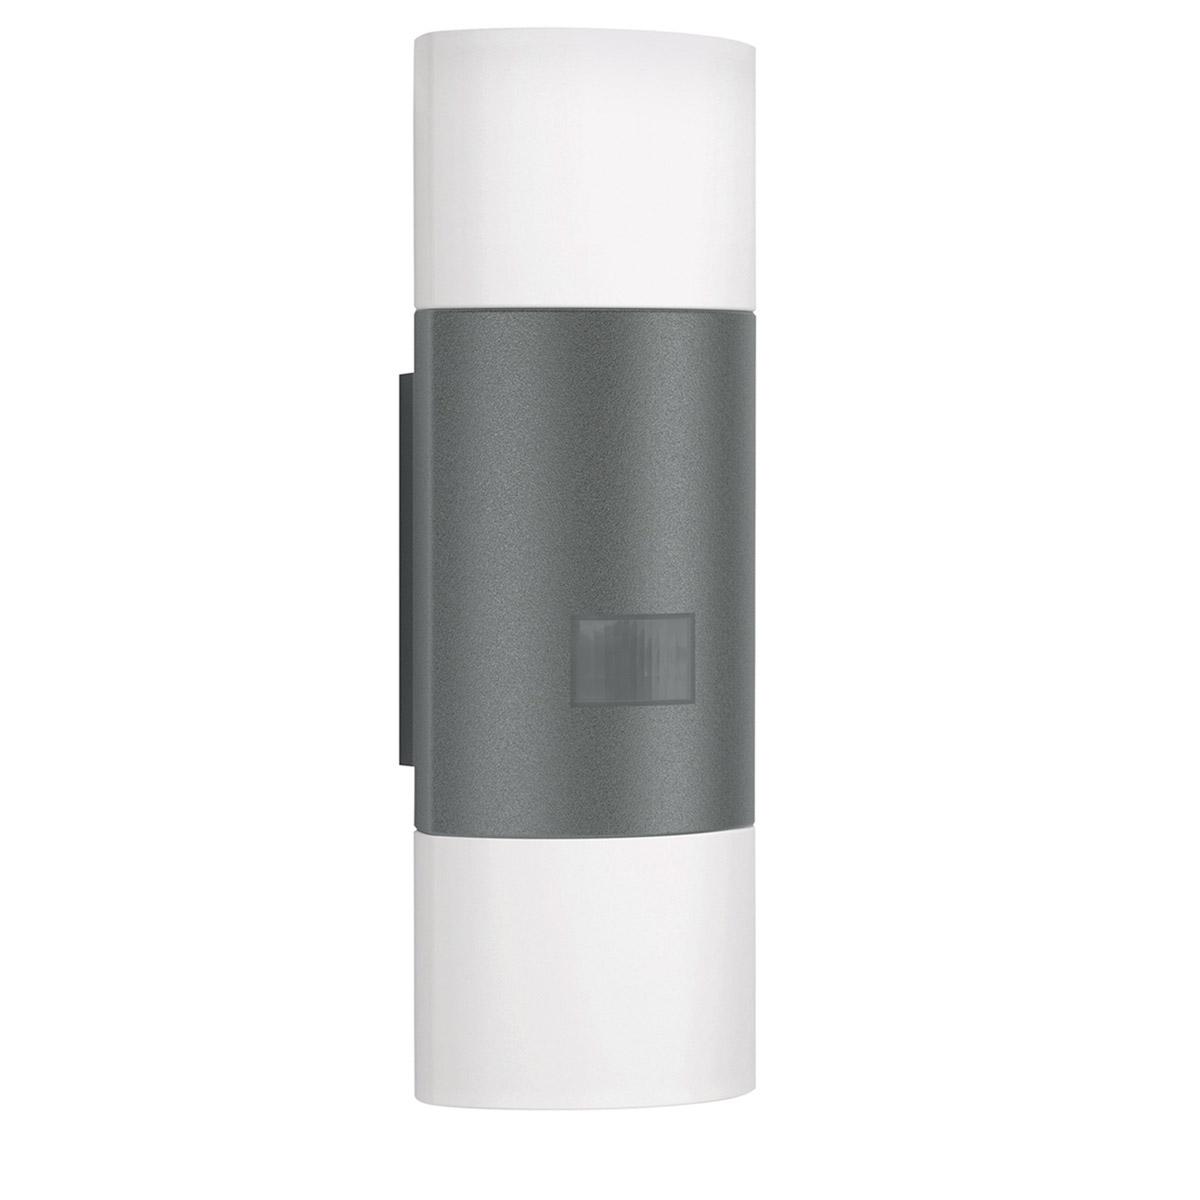 Steinel L910 LED sensorlamp